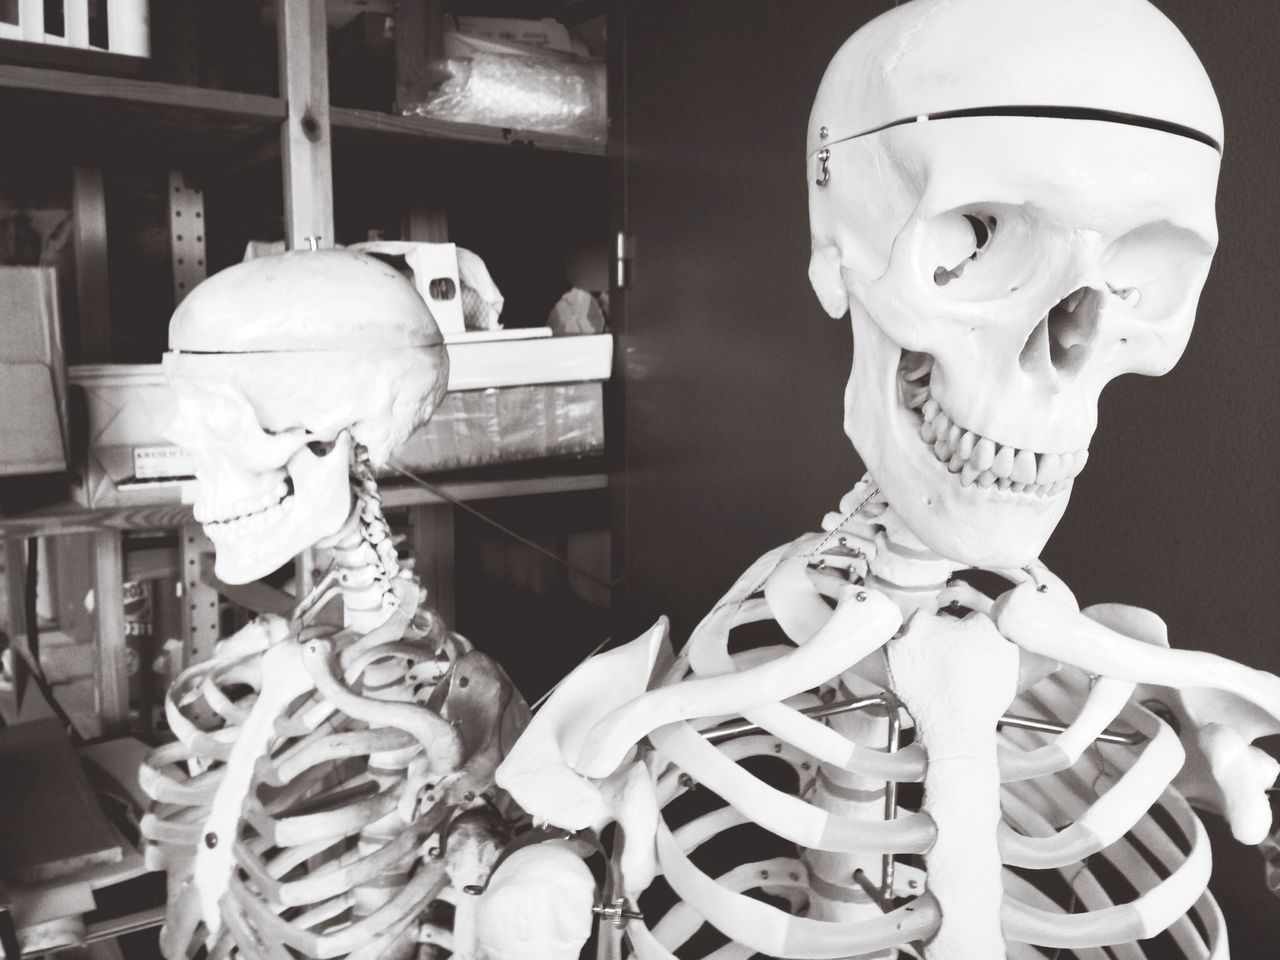 Human skeletons in laboratory